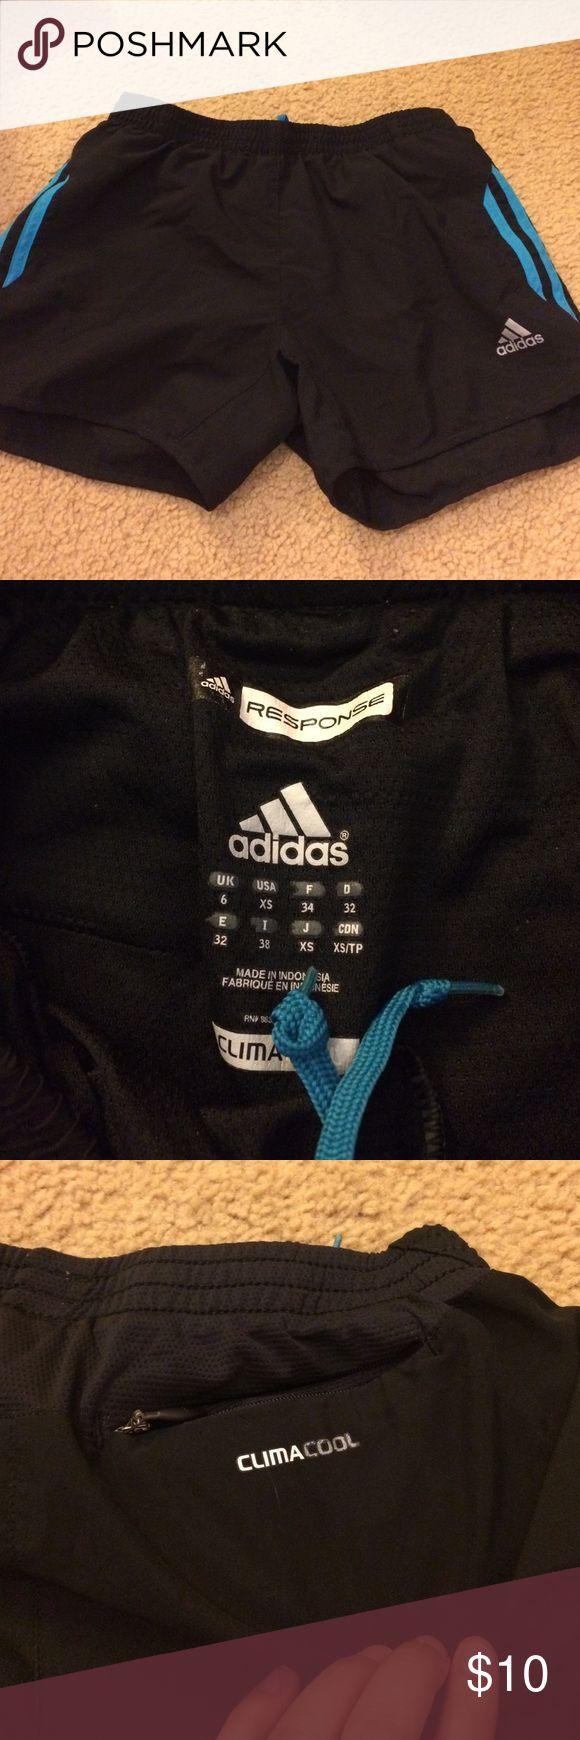 Adidas black blue running shorts Adidas response black with blue stripe running shorts. Climacool. Size XS. Back pocket. Great condition Adidas Shorts